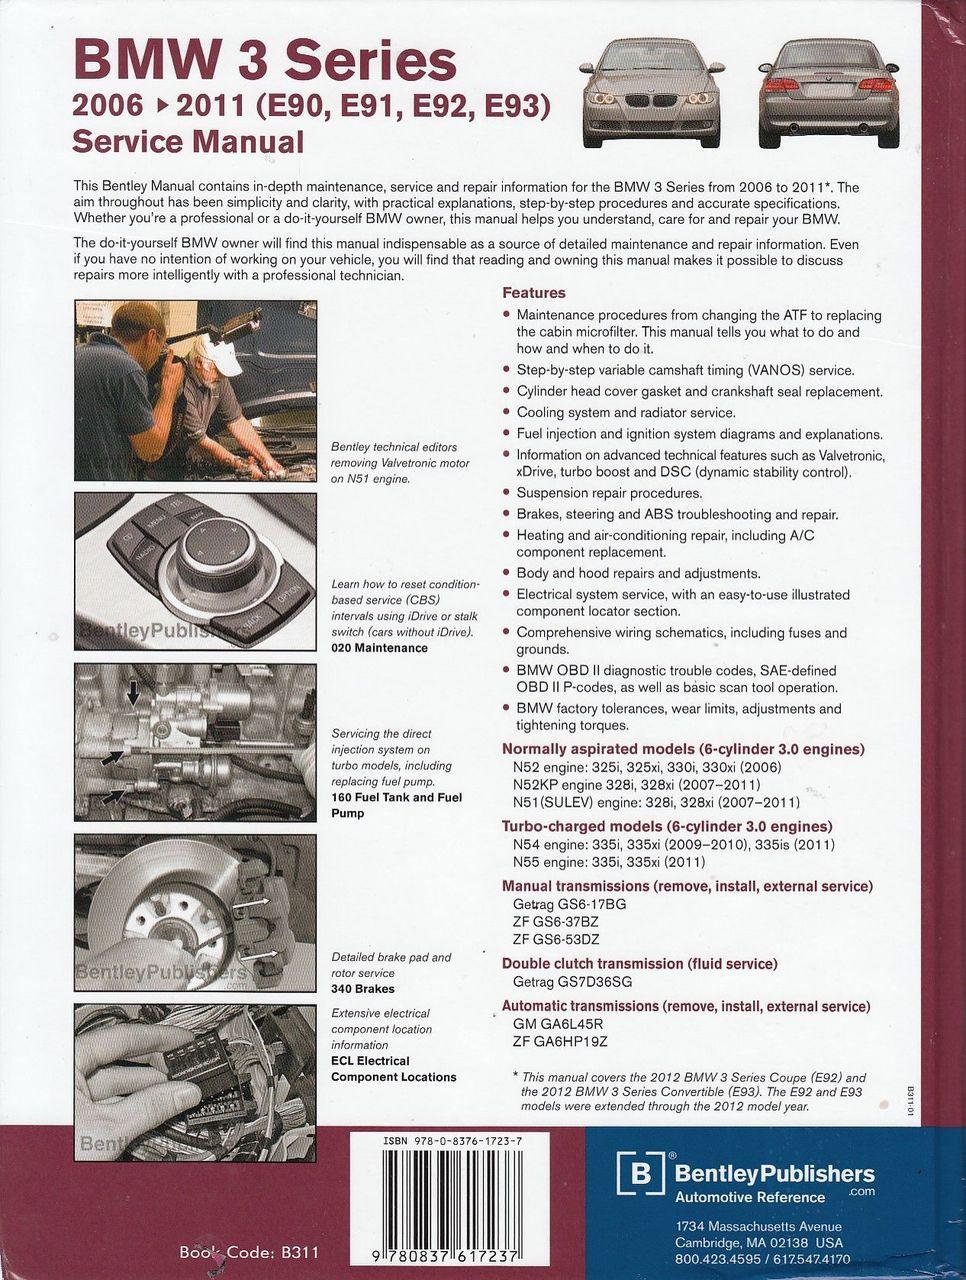 ... BMW 3 Series E90 E91 E92 E93 2006 - 2011 Workshop Manual Back Cover ...